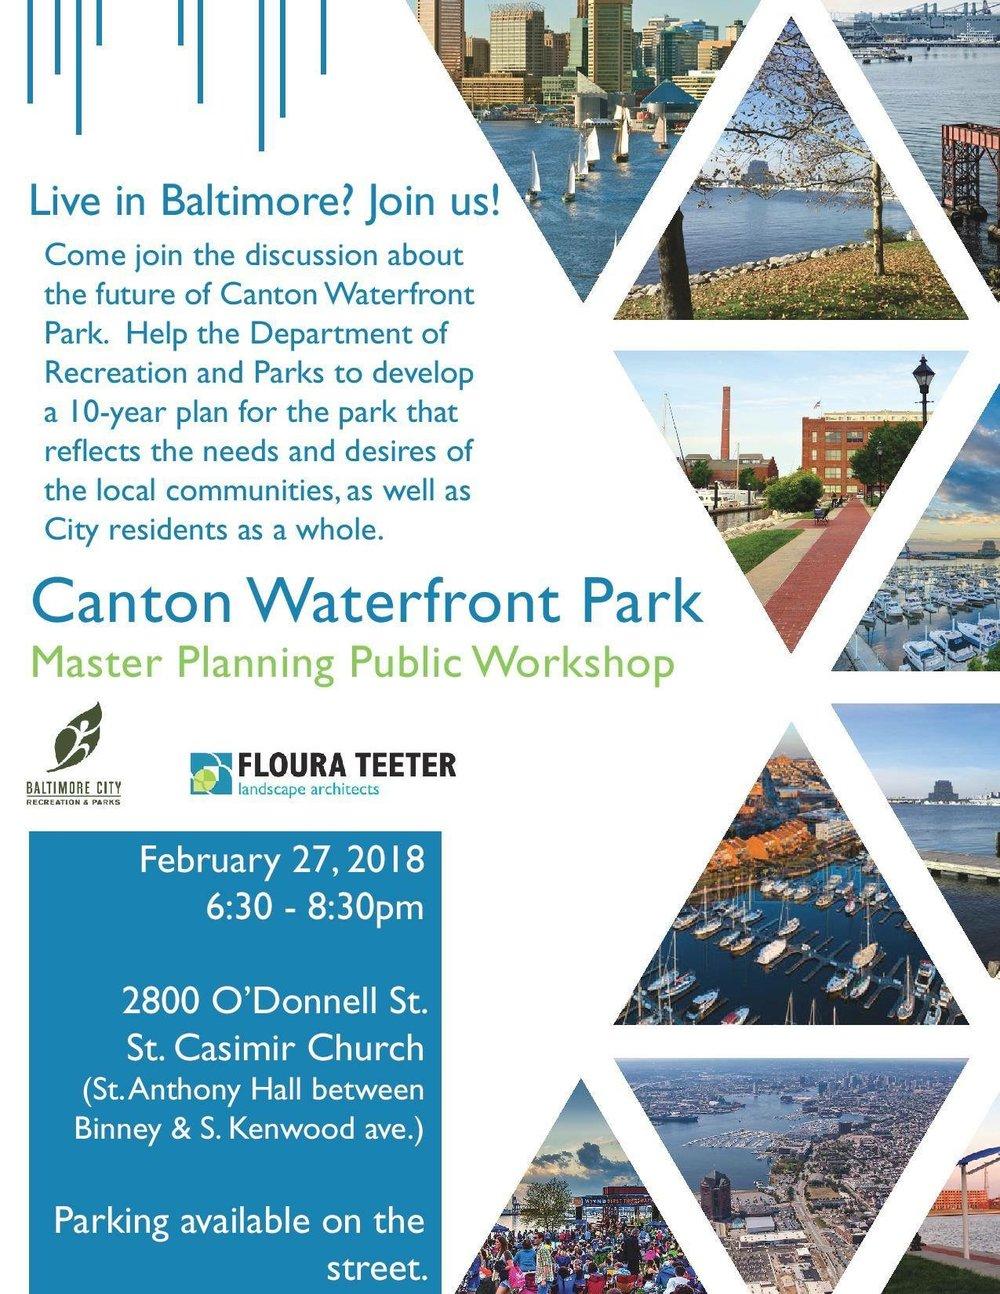 cantonwaterfrontparkmeeting.JPG